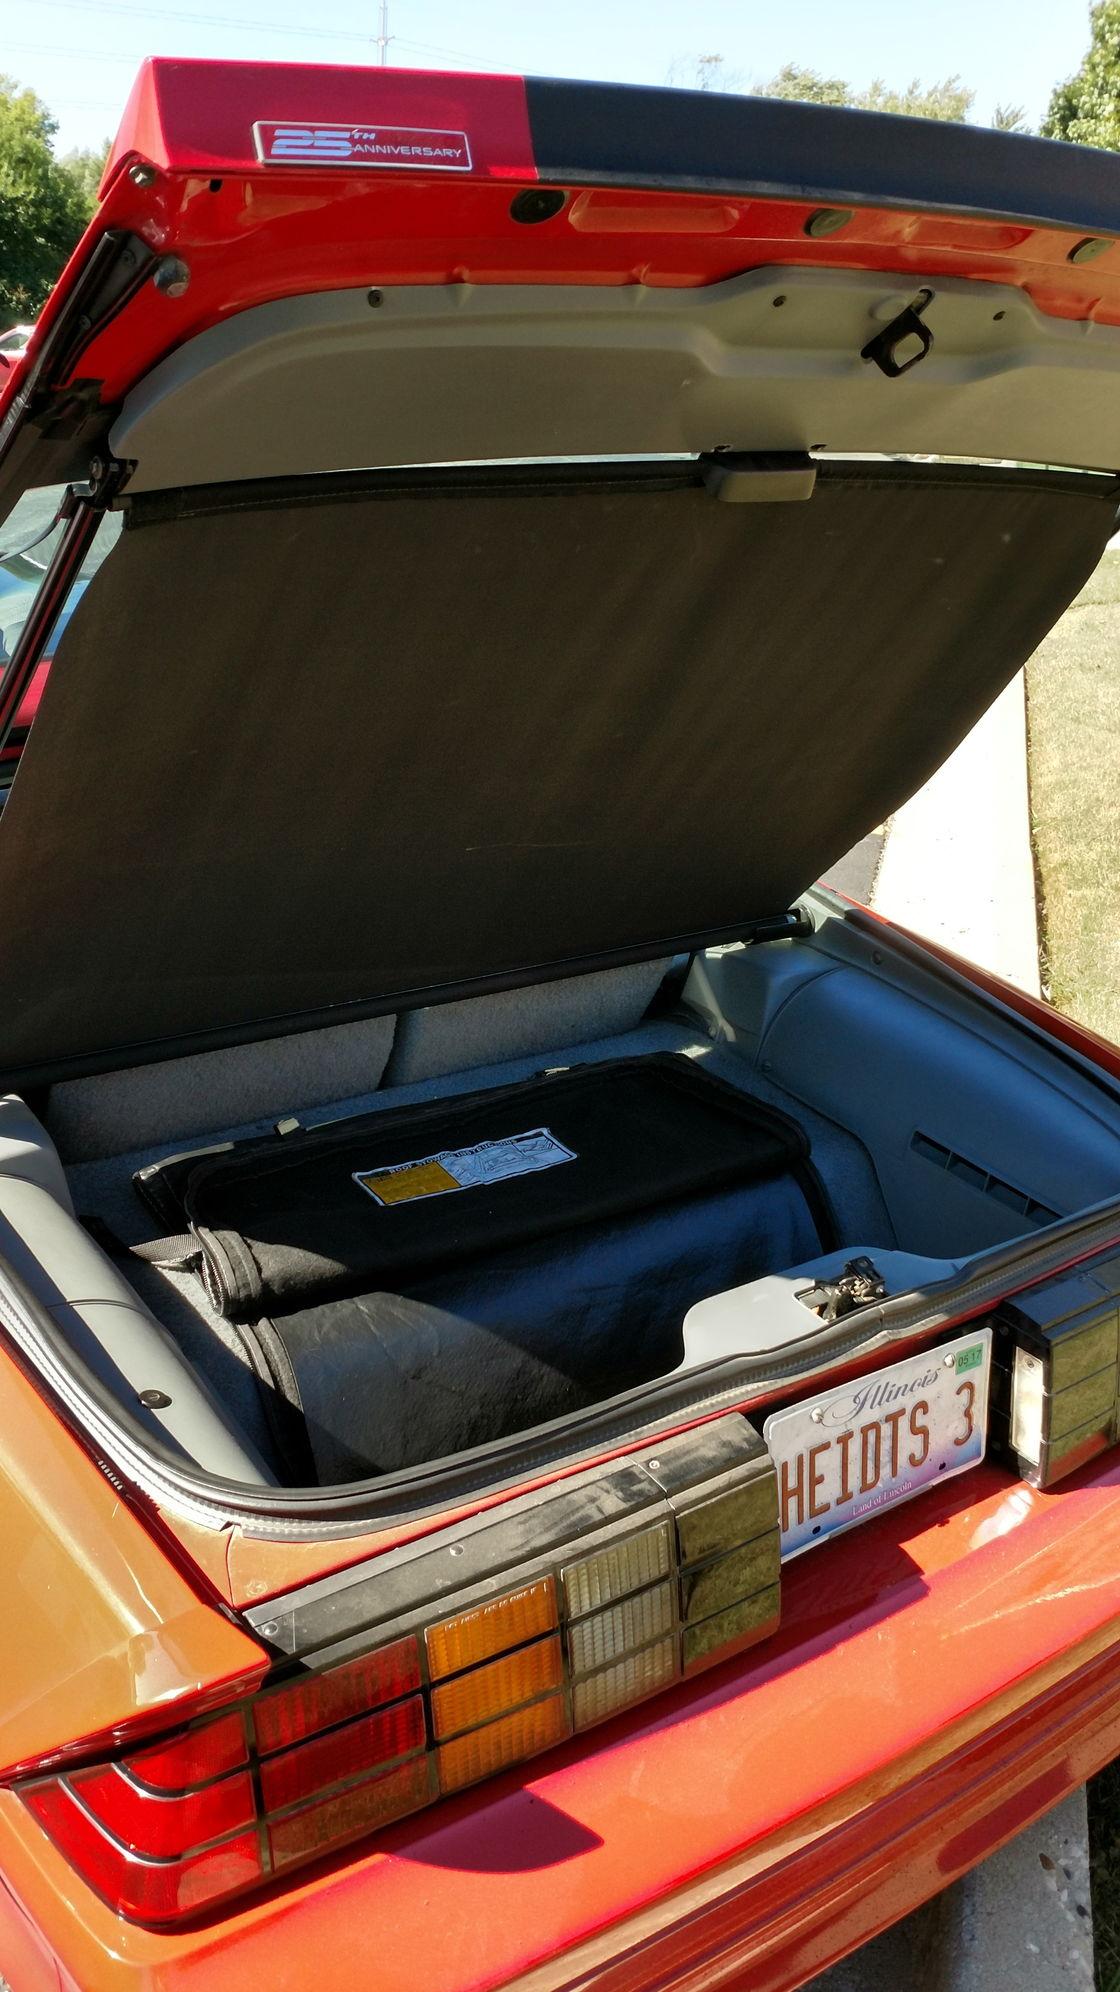 Illinois 1992 Heidts Camaro Test Car Third Generation F